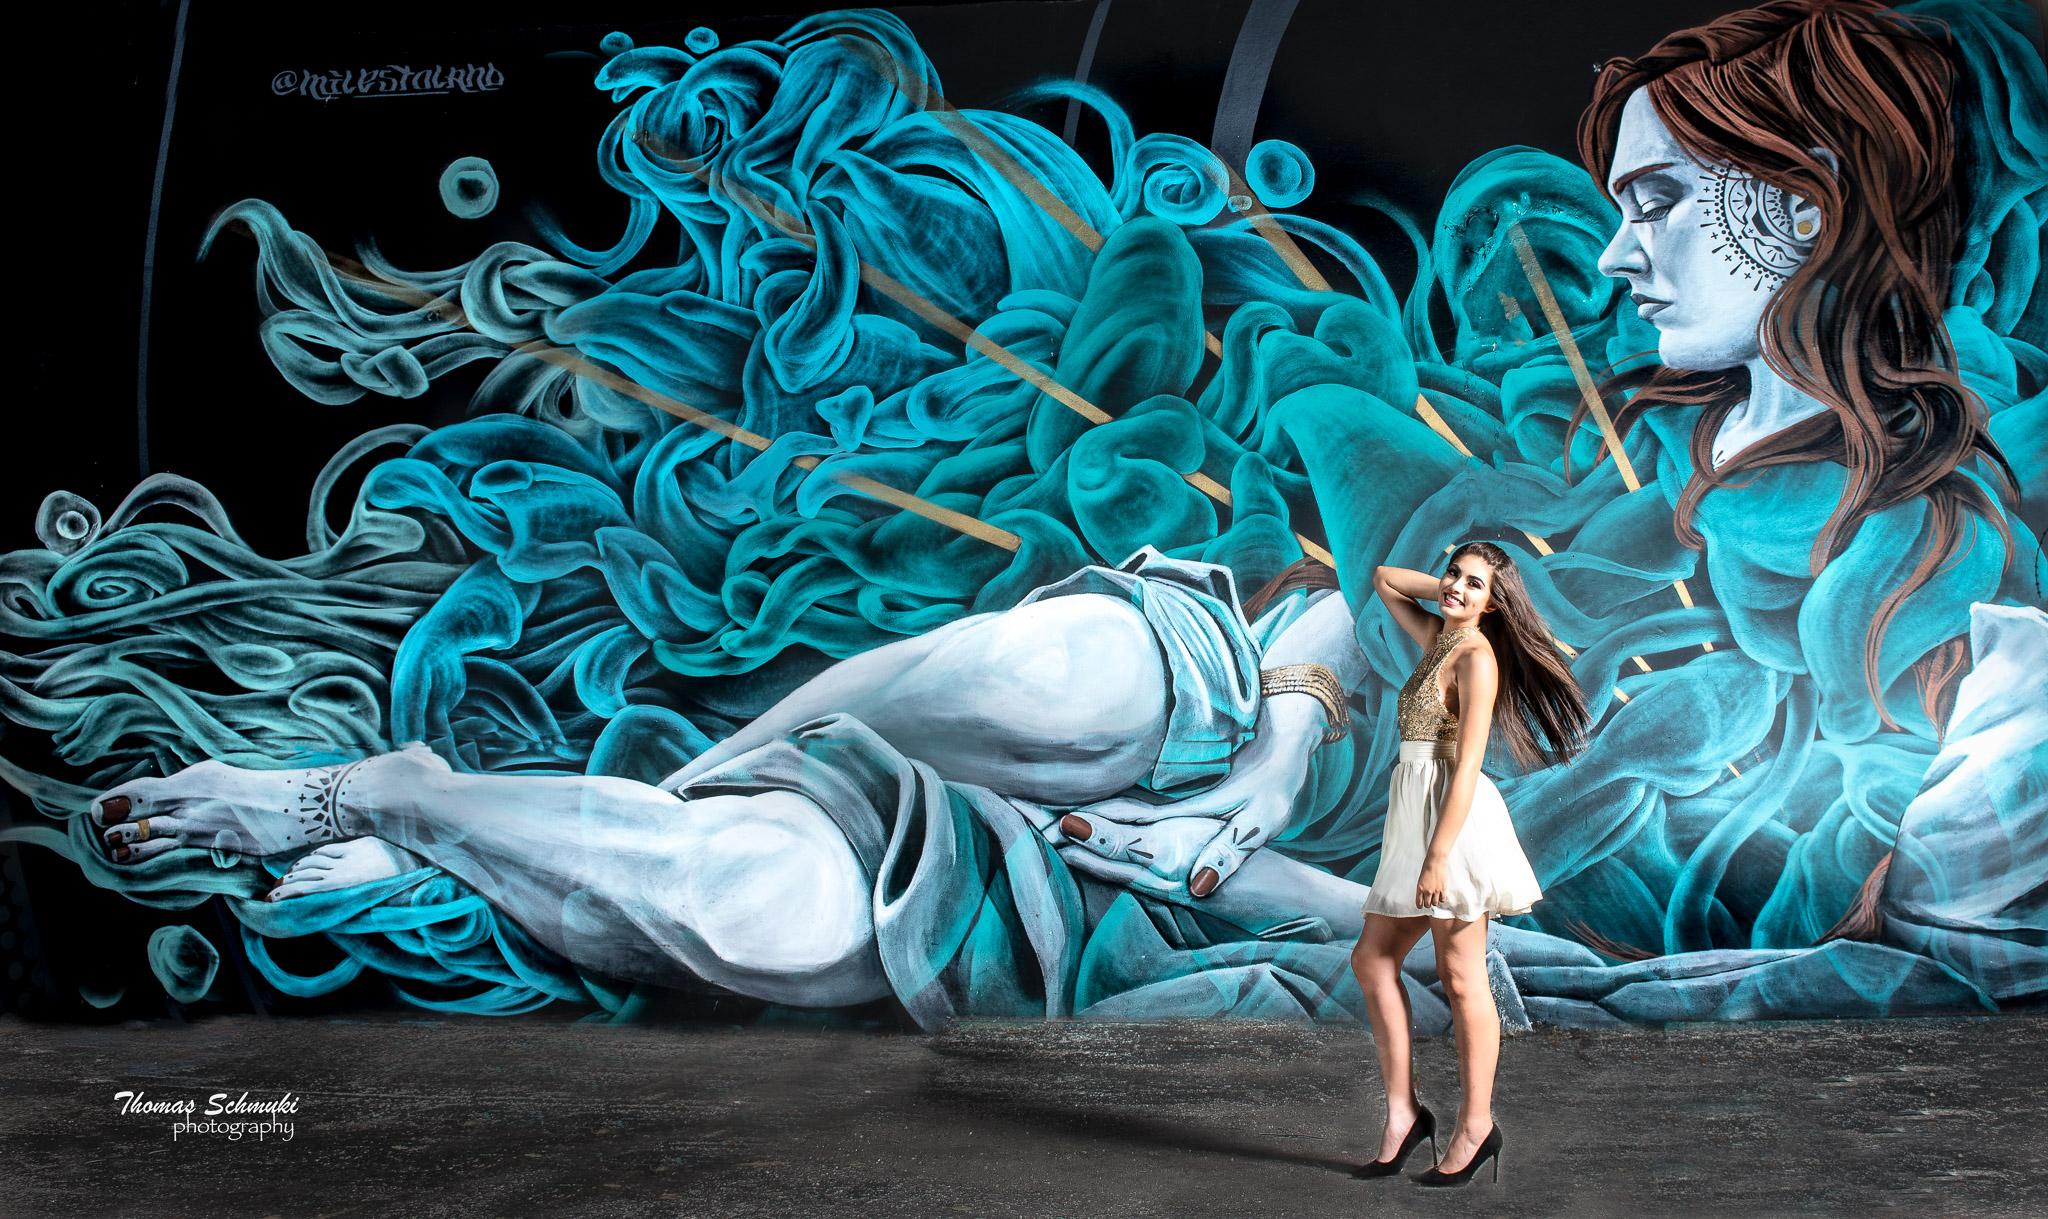 Wynwood Walls Model Shoot #1 with beautiful model Kelsey Silva Espino